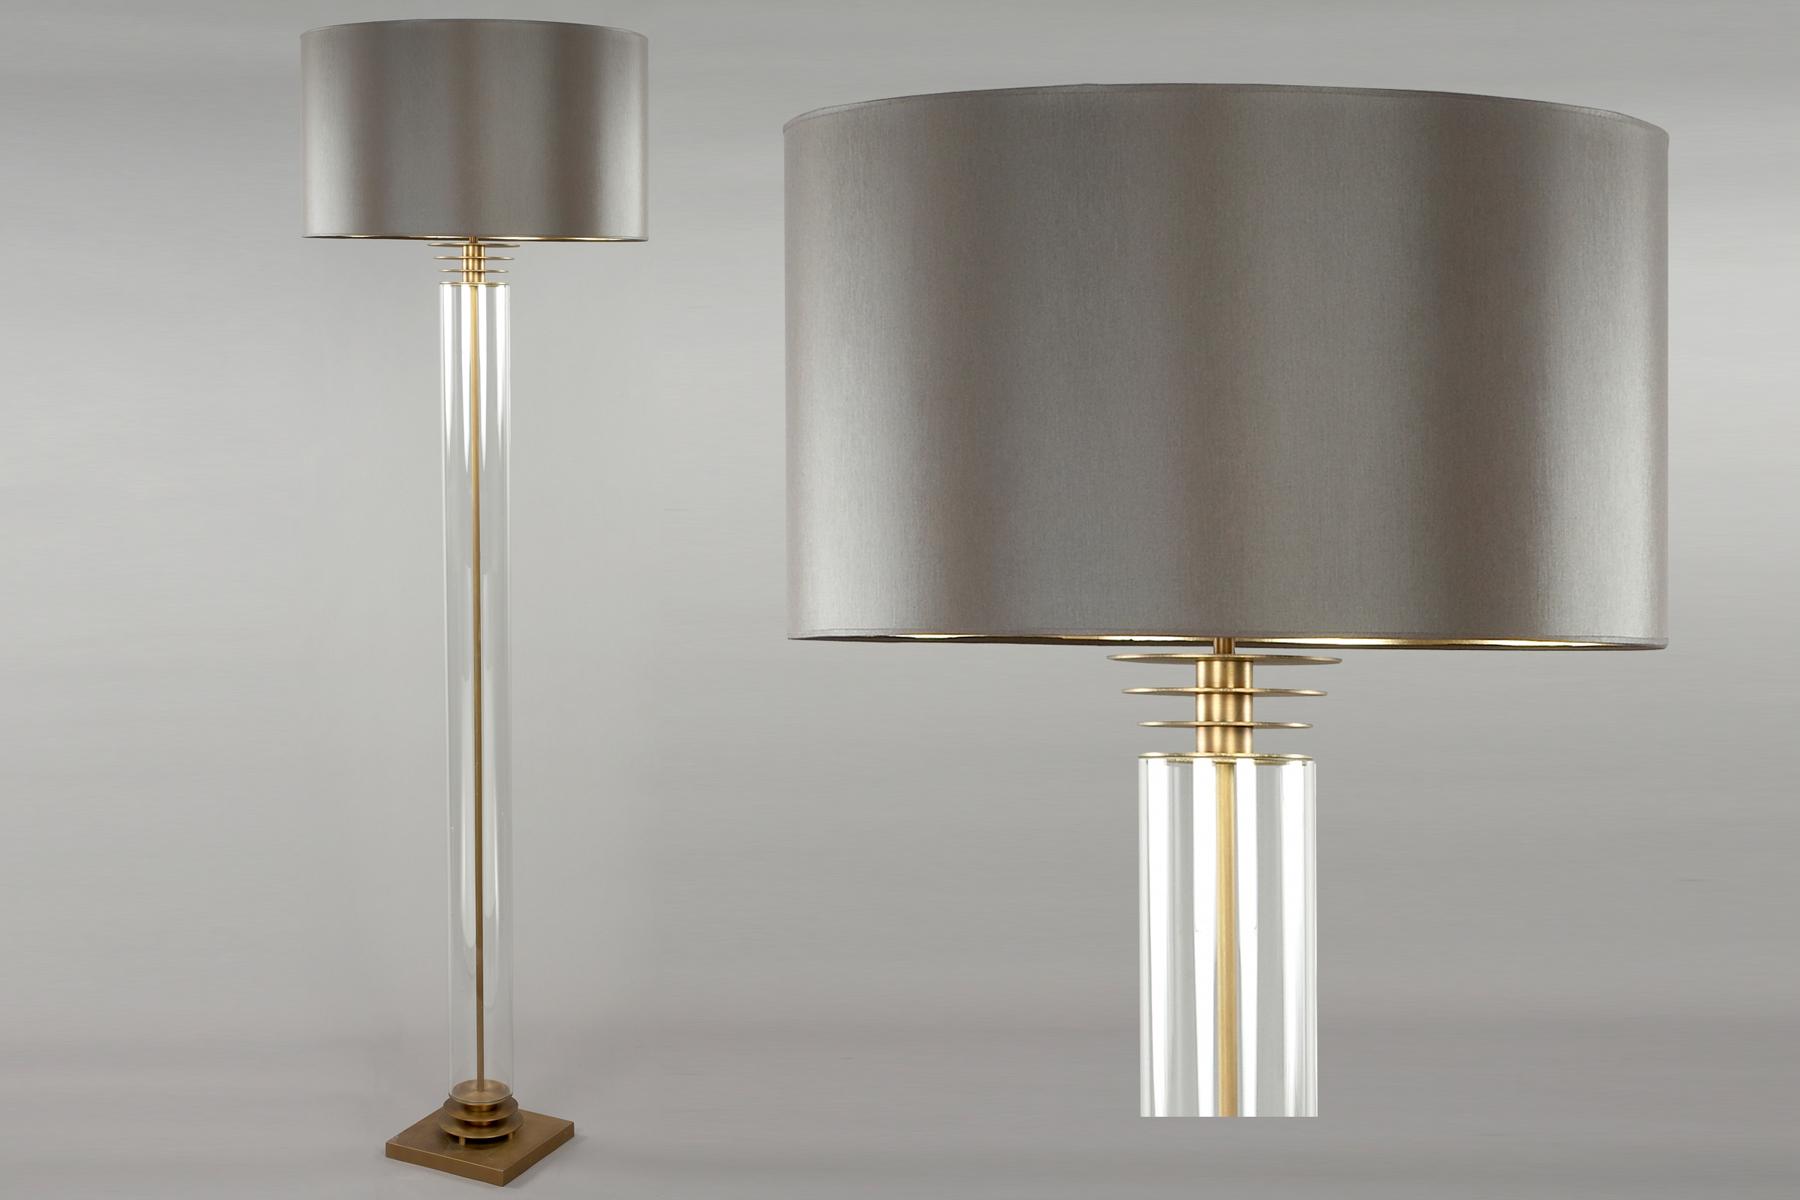 Reasons To Buy Glass Floor Lamps